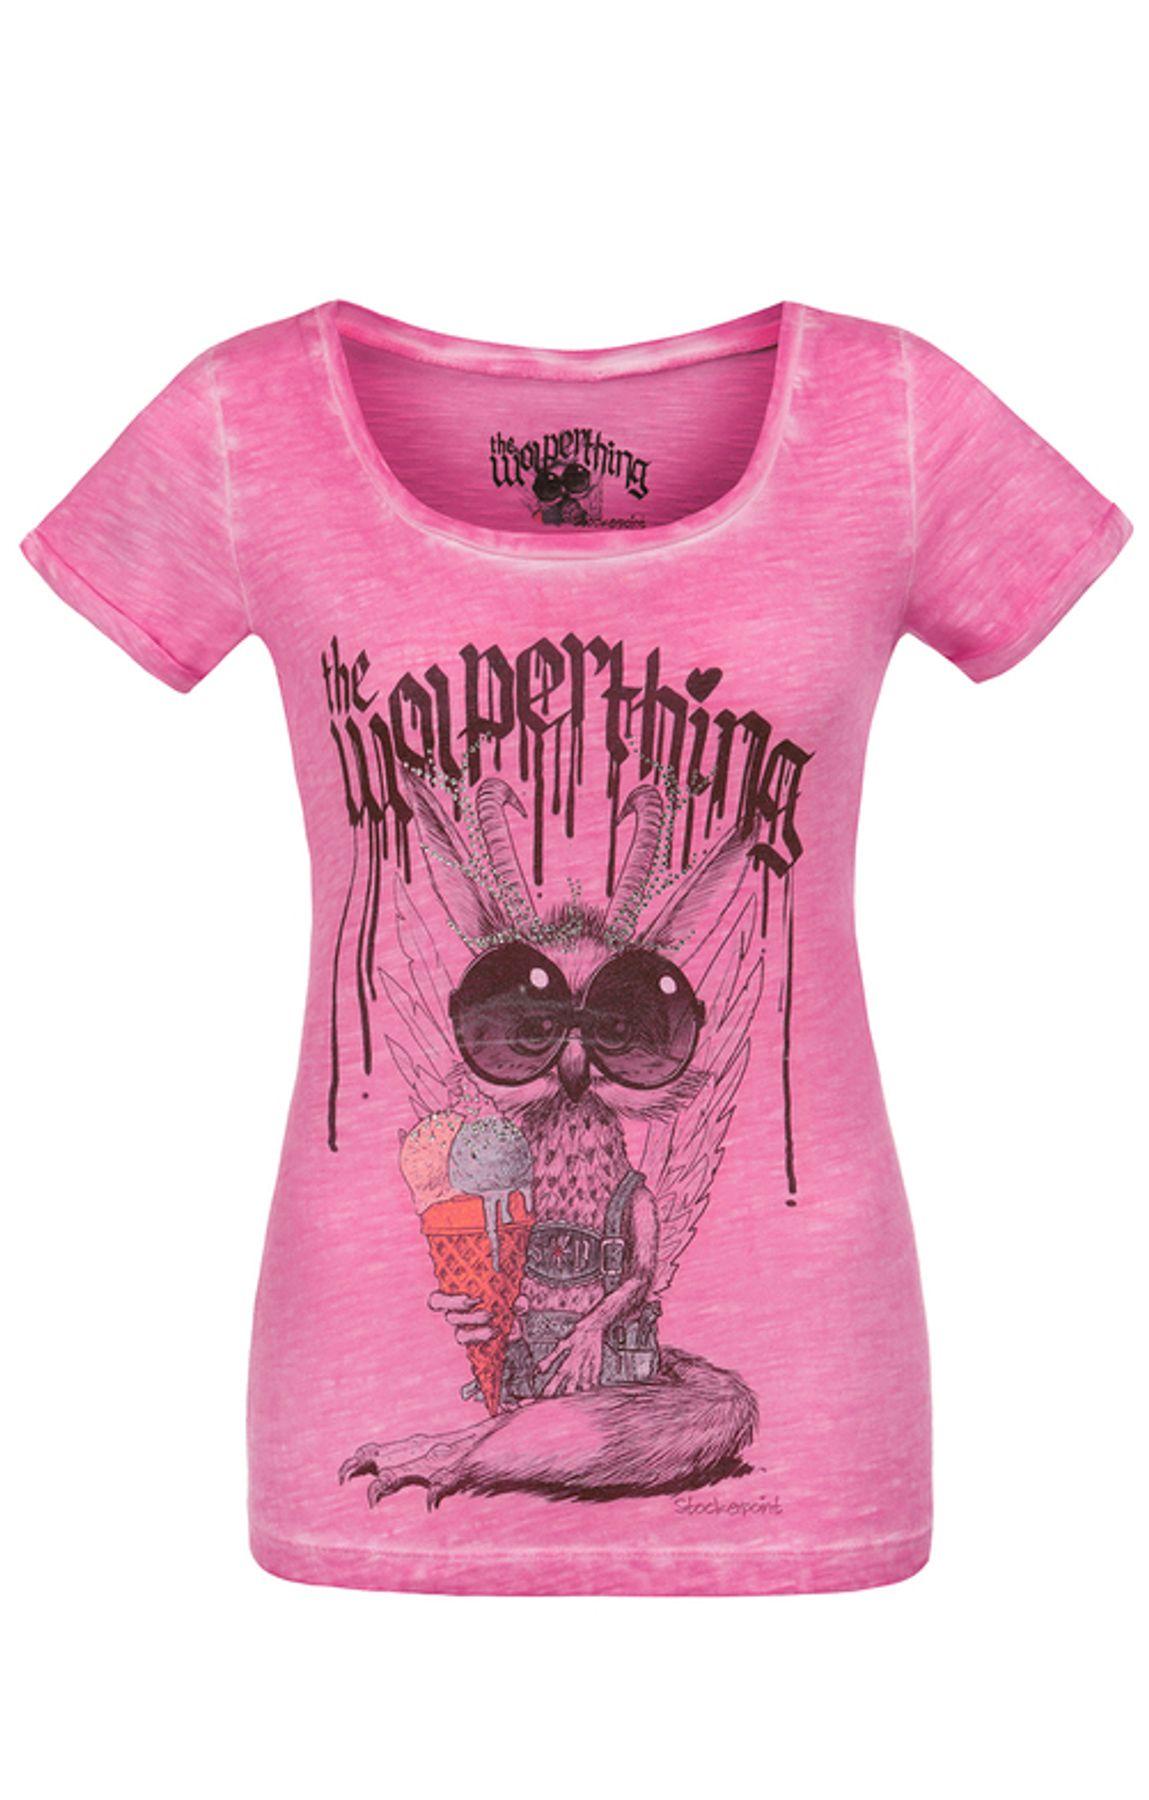 Stockerpoint - Kinder Trachten T-Shirt, Wolpigirl – Bild 3